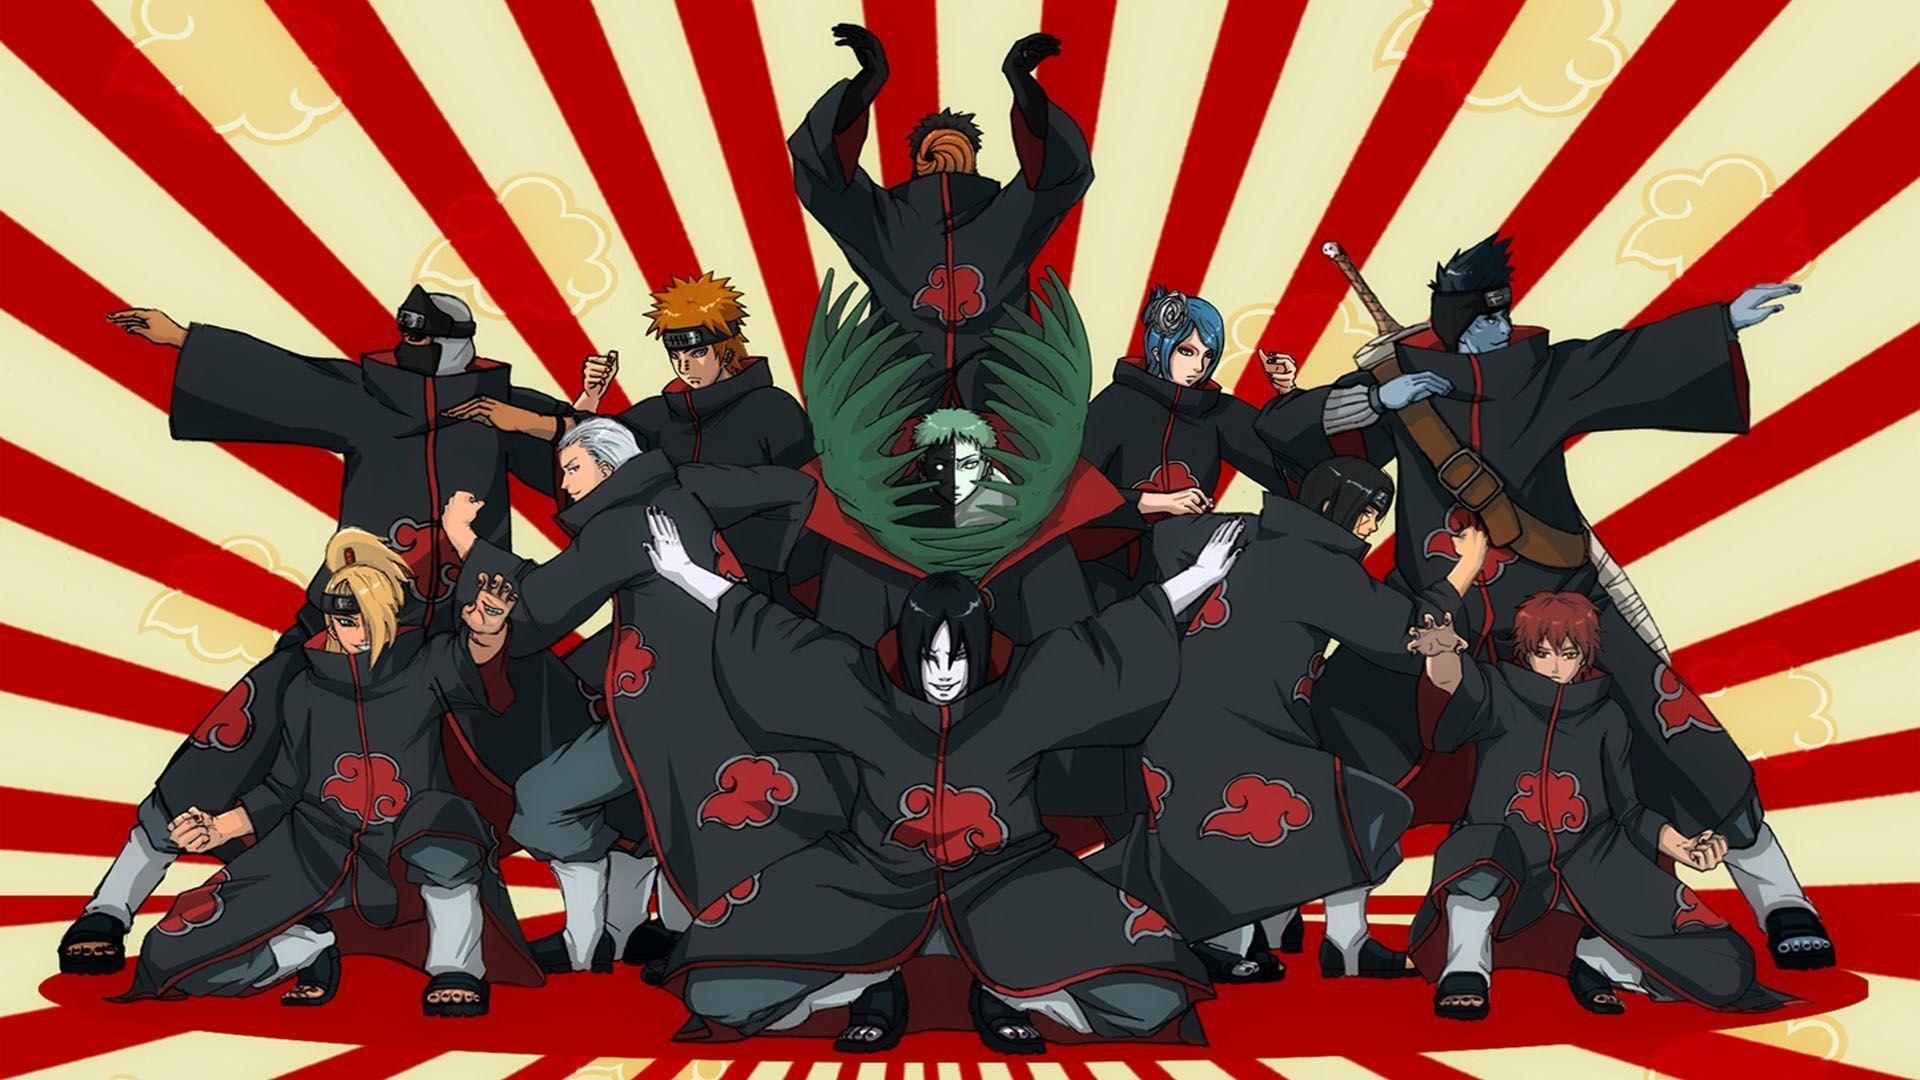 Download Naruto Free Akatsuki Funny Wallpaper Background Picture .